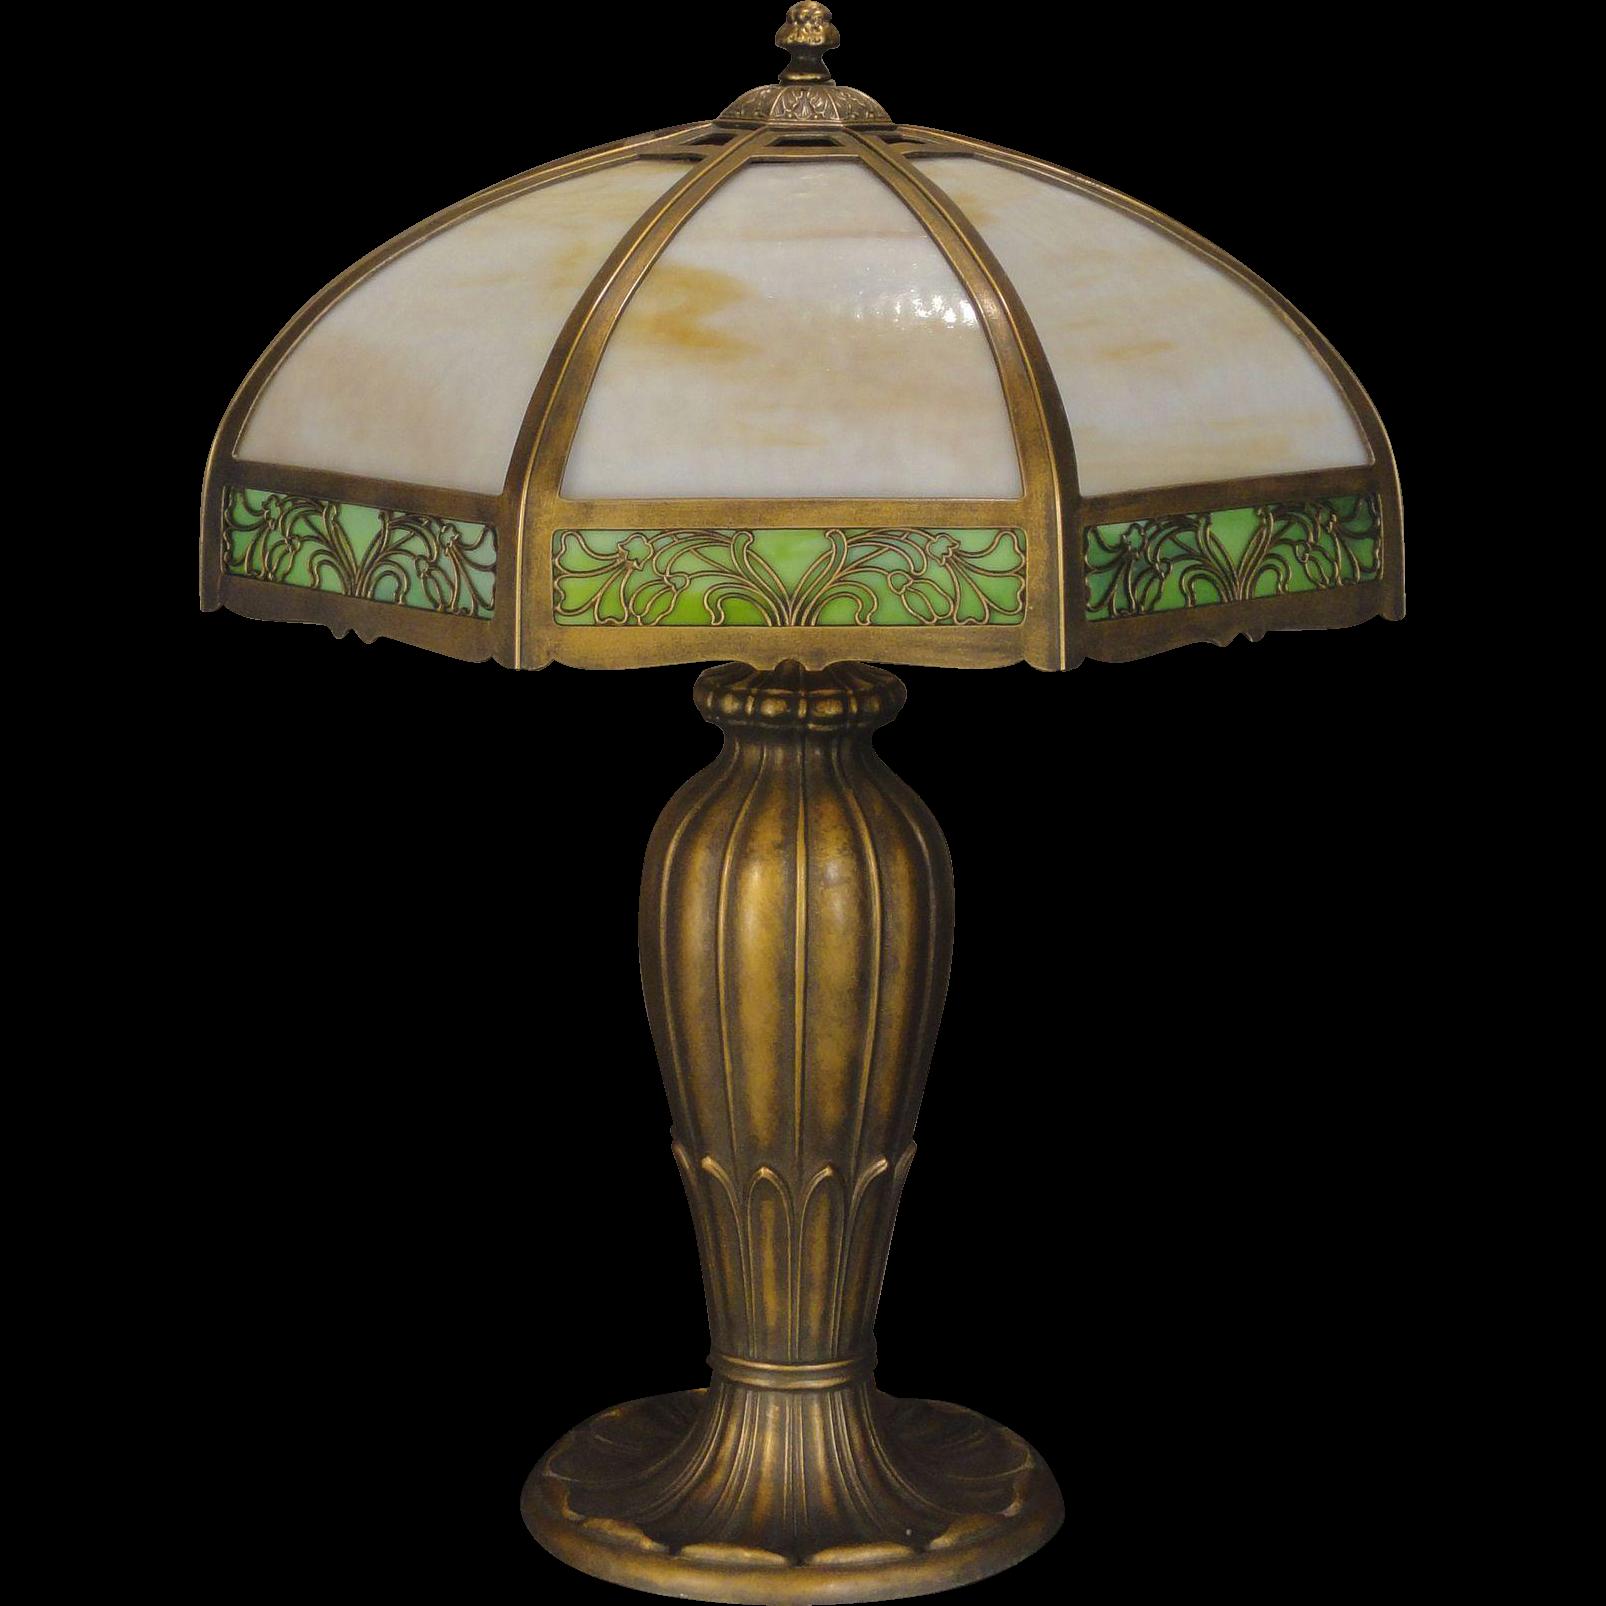 Large Elegant Art Nouveau 24 Panel Slag Glass Lamp From